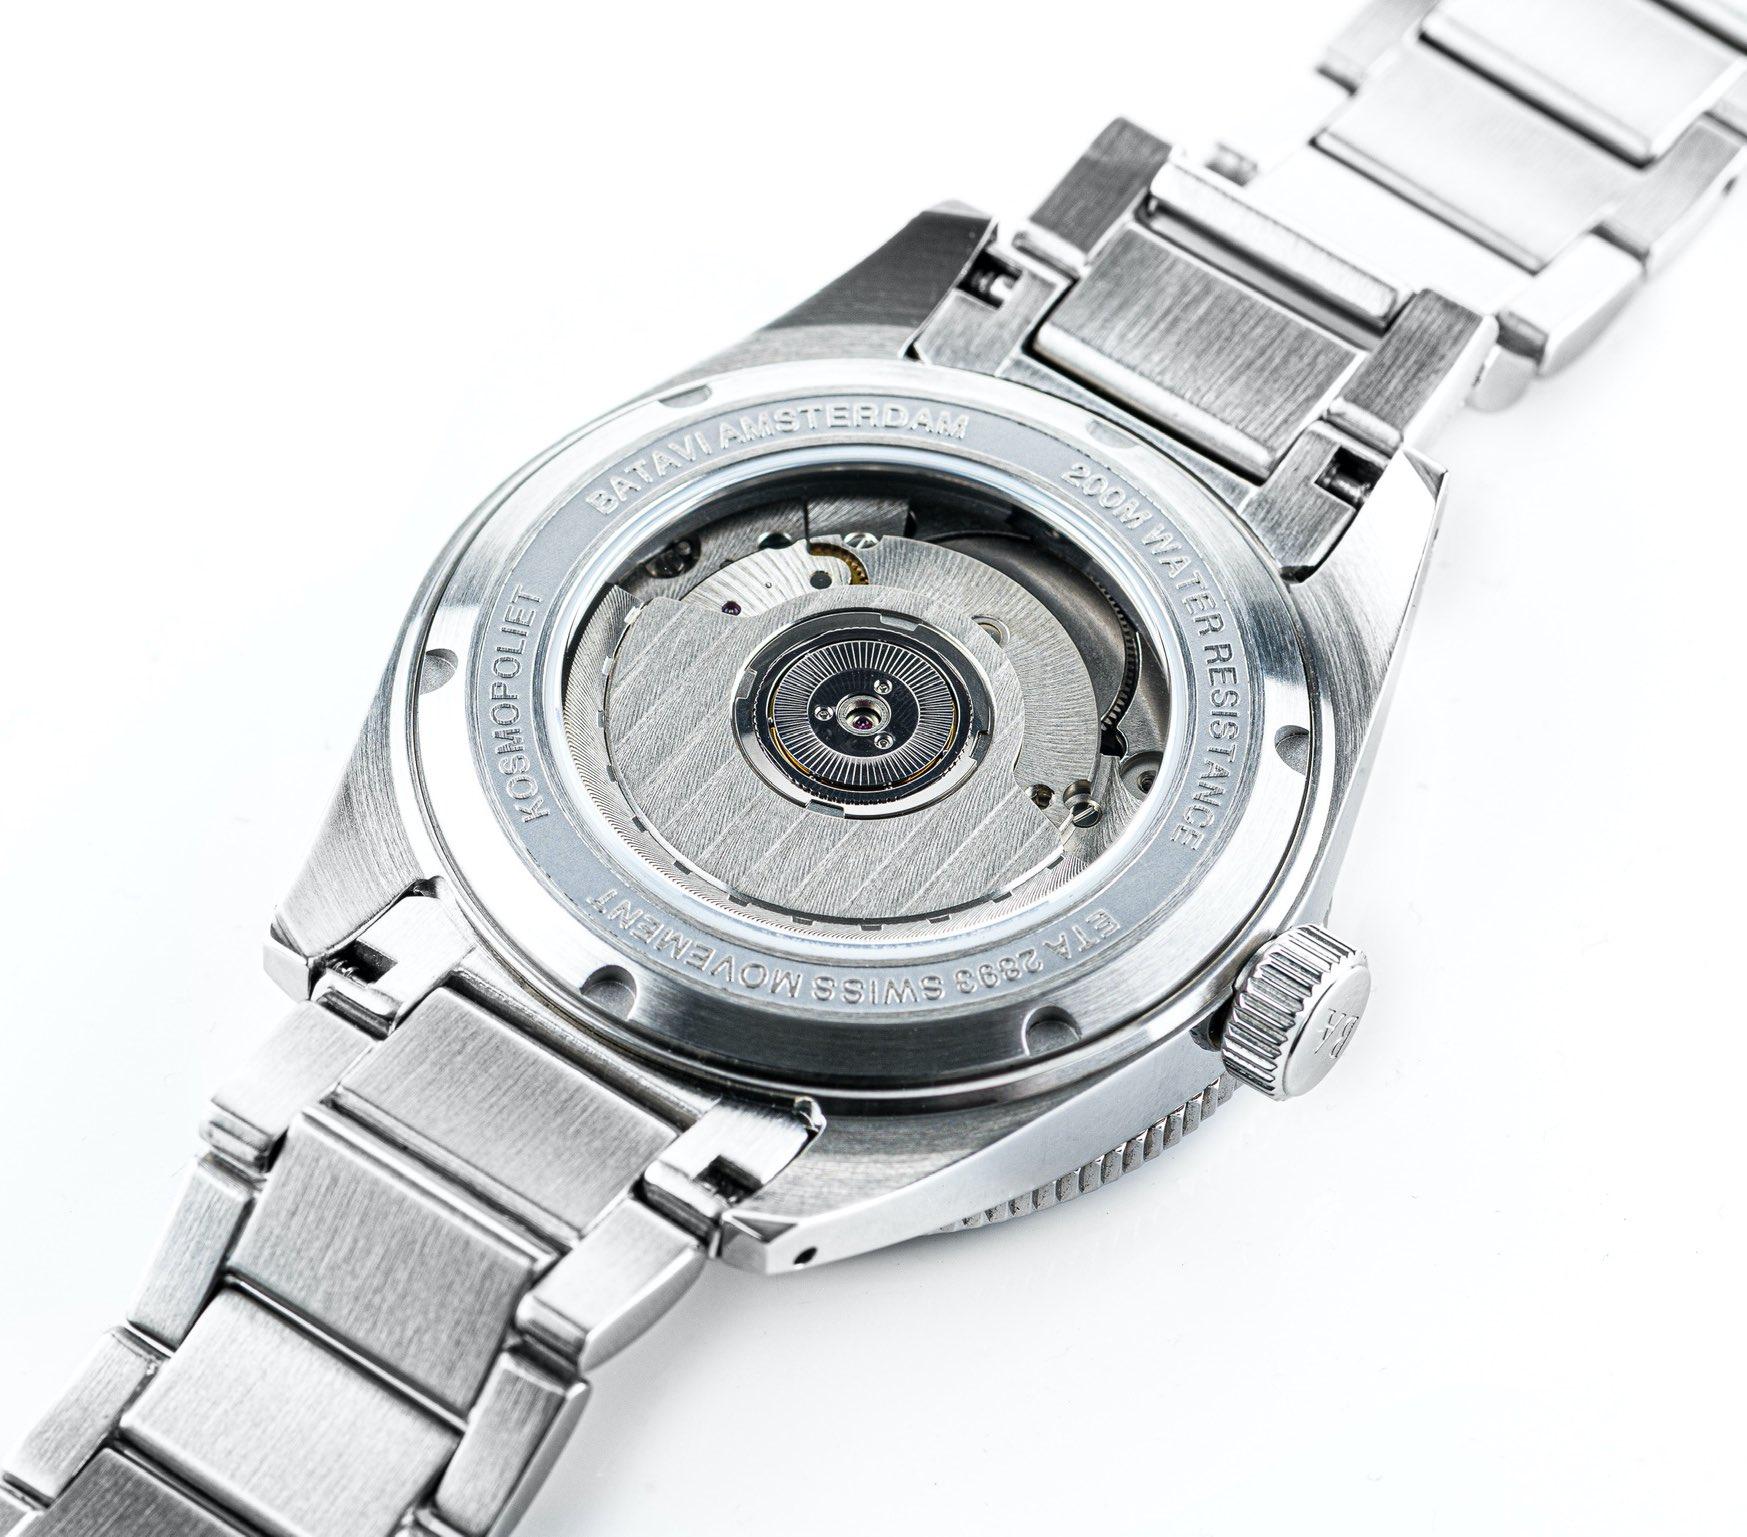 Batavi Kosmopoliet GMT